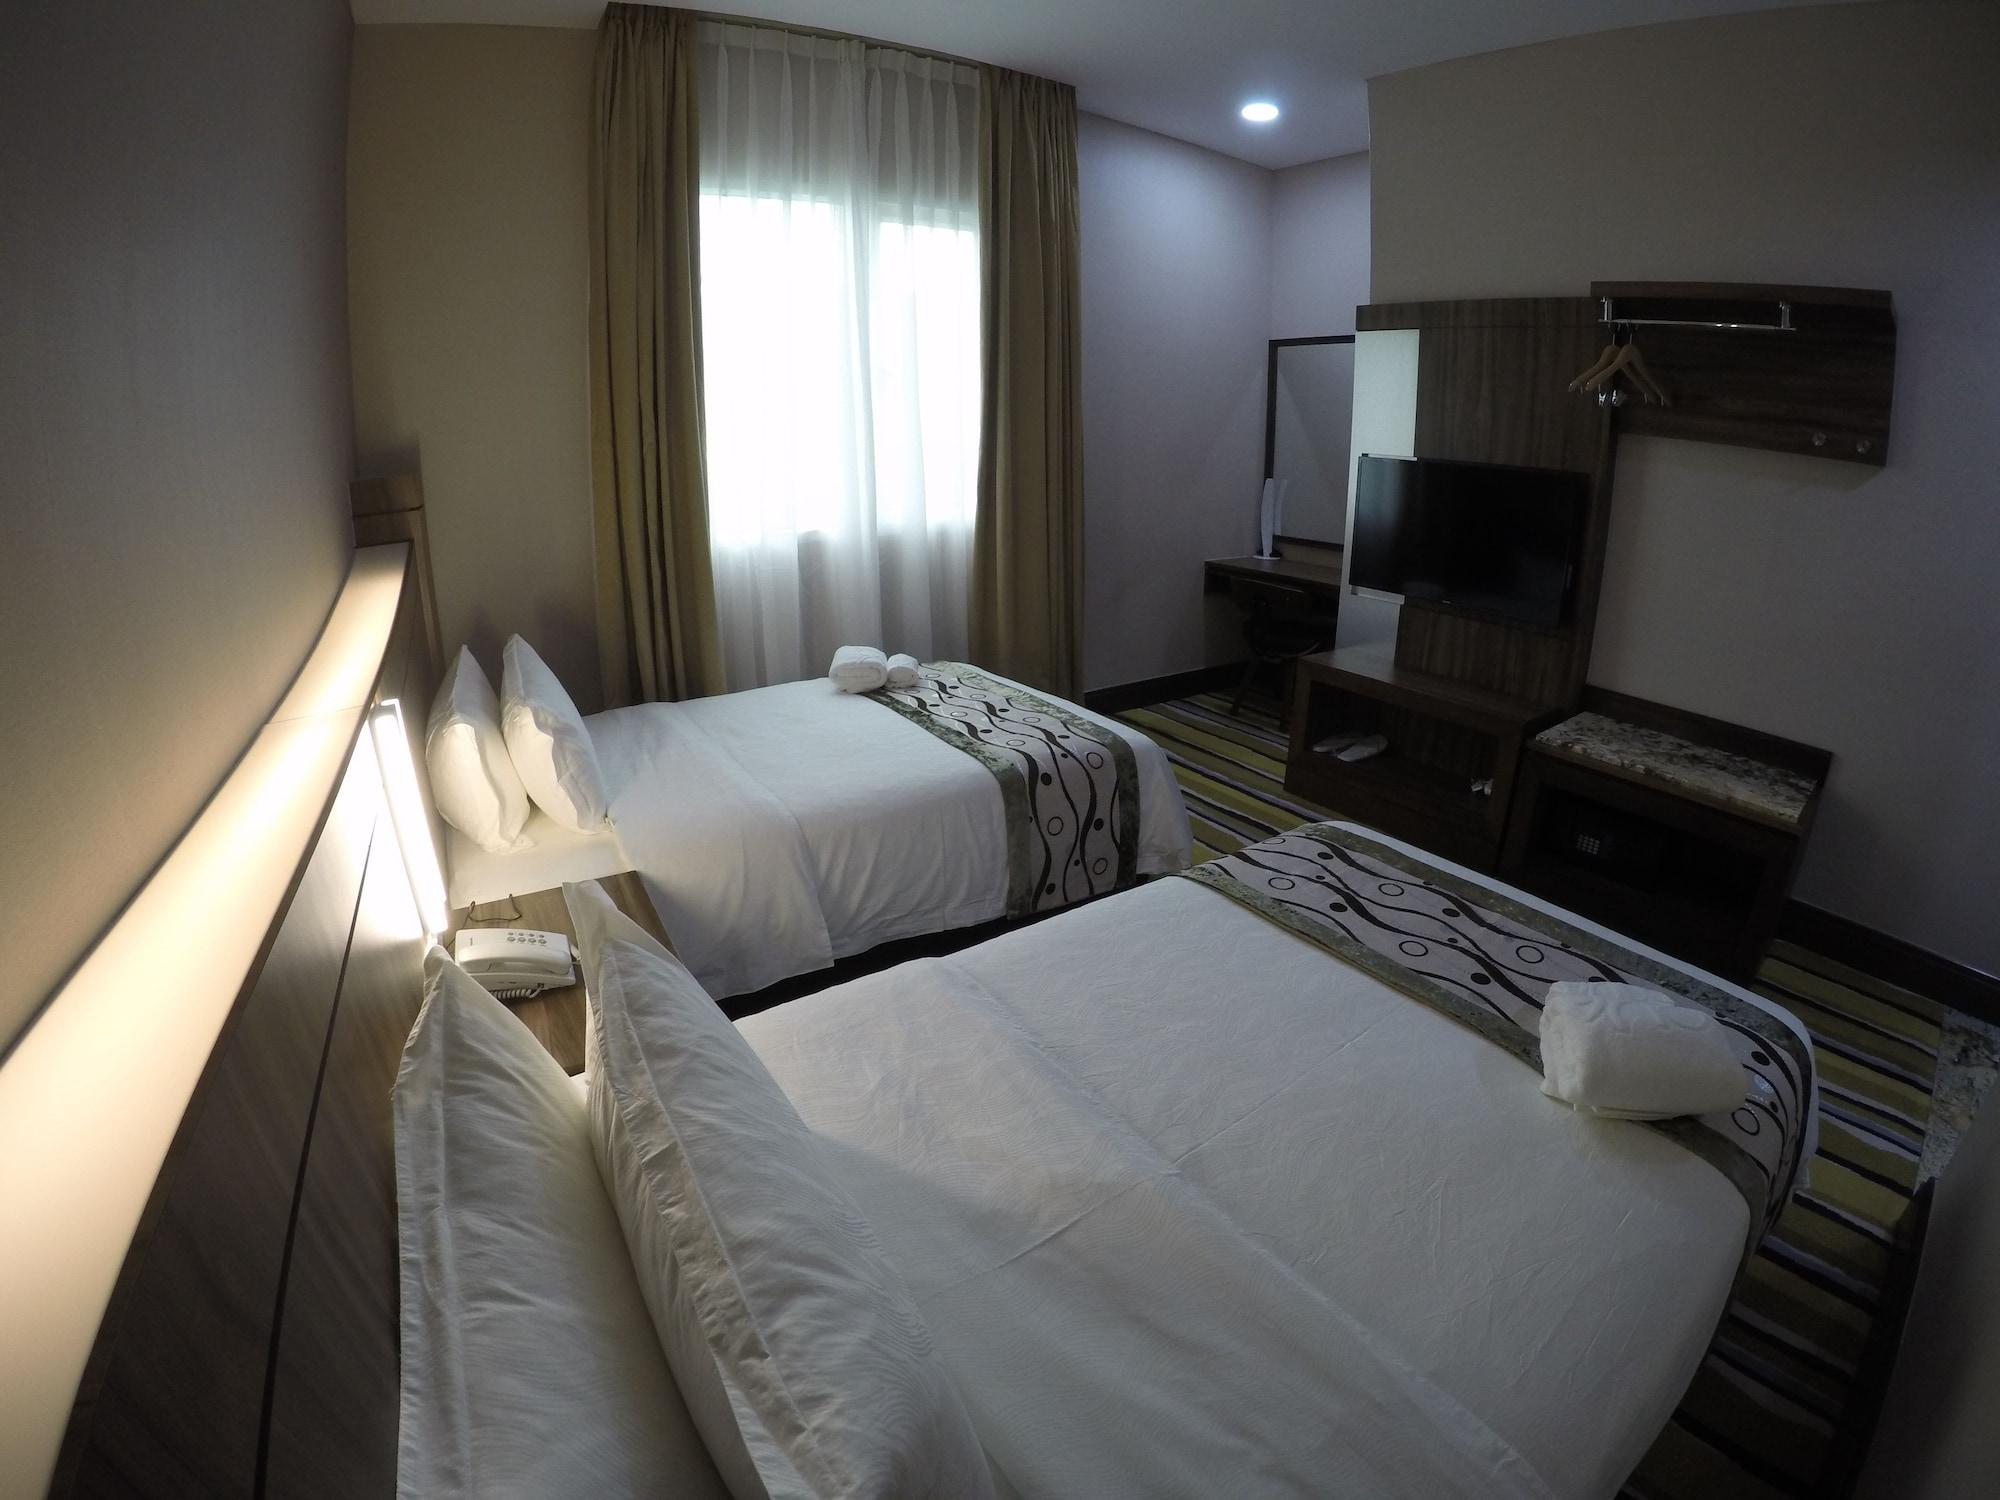 Nova Hotel Miri, Miri